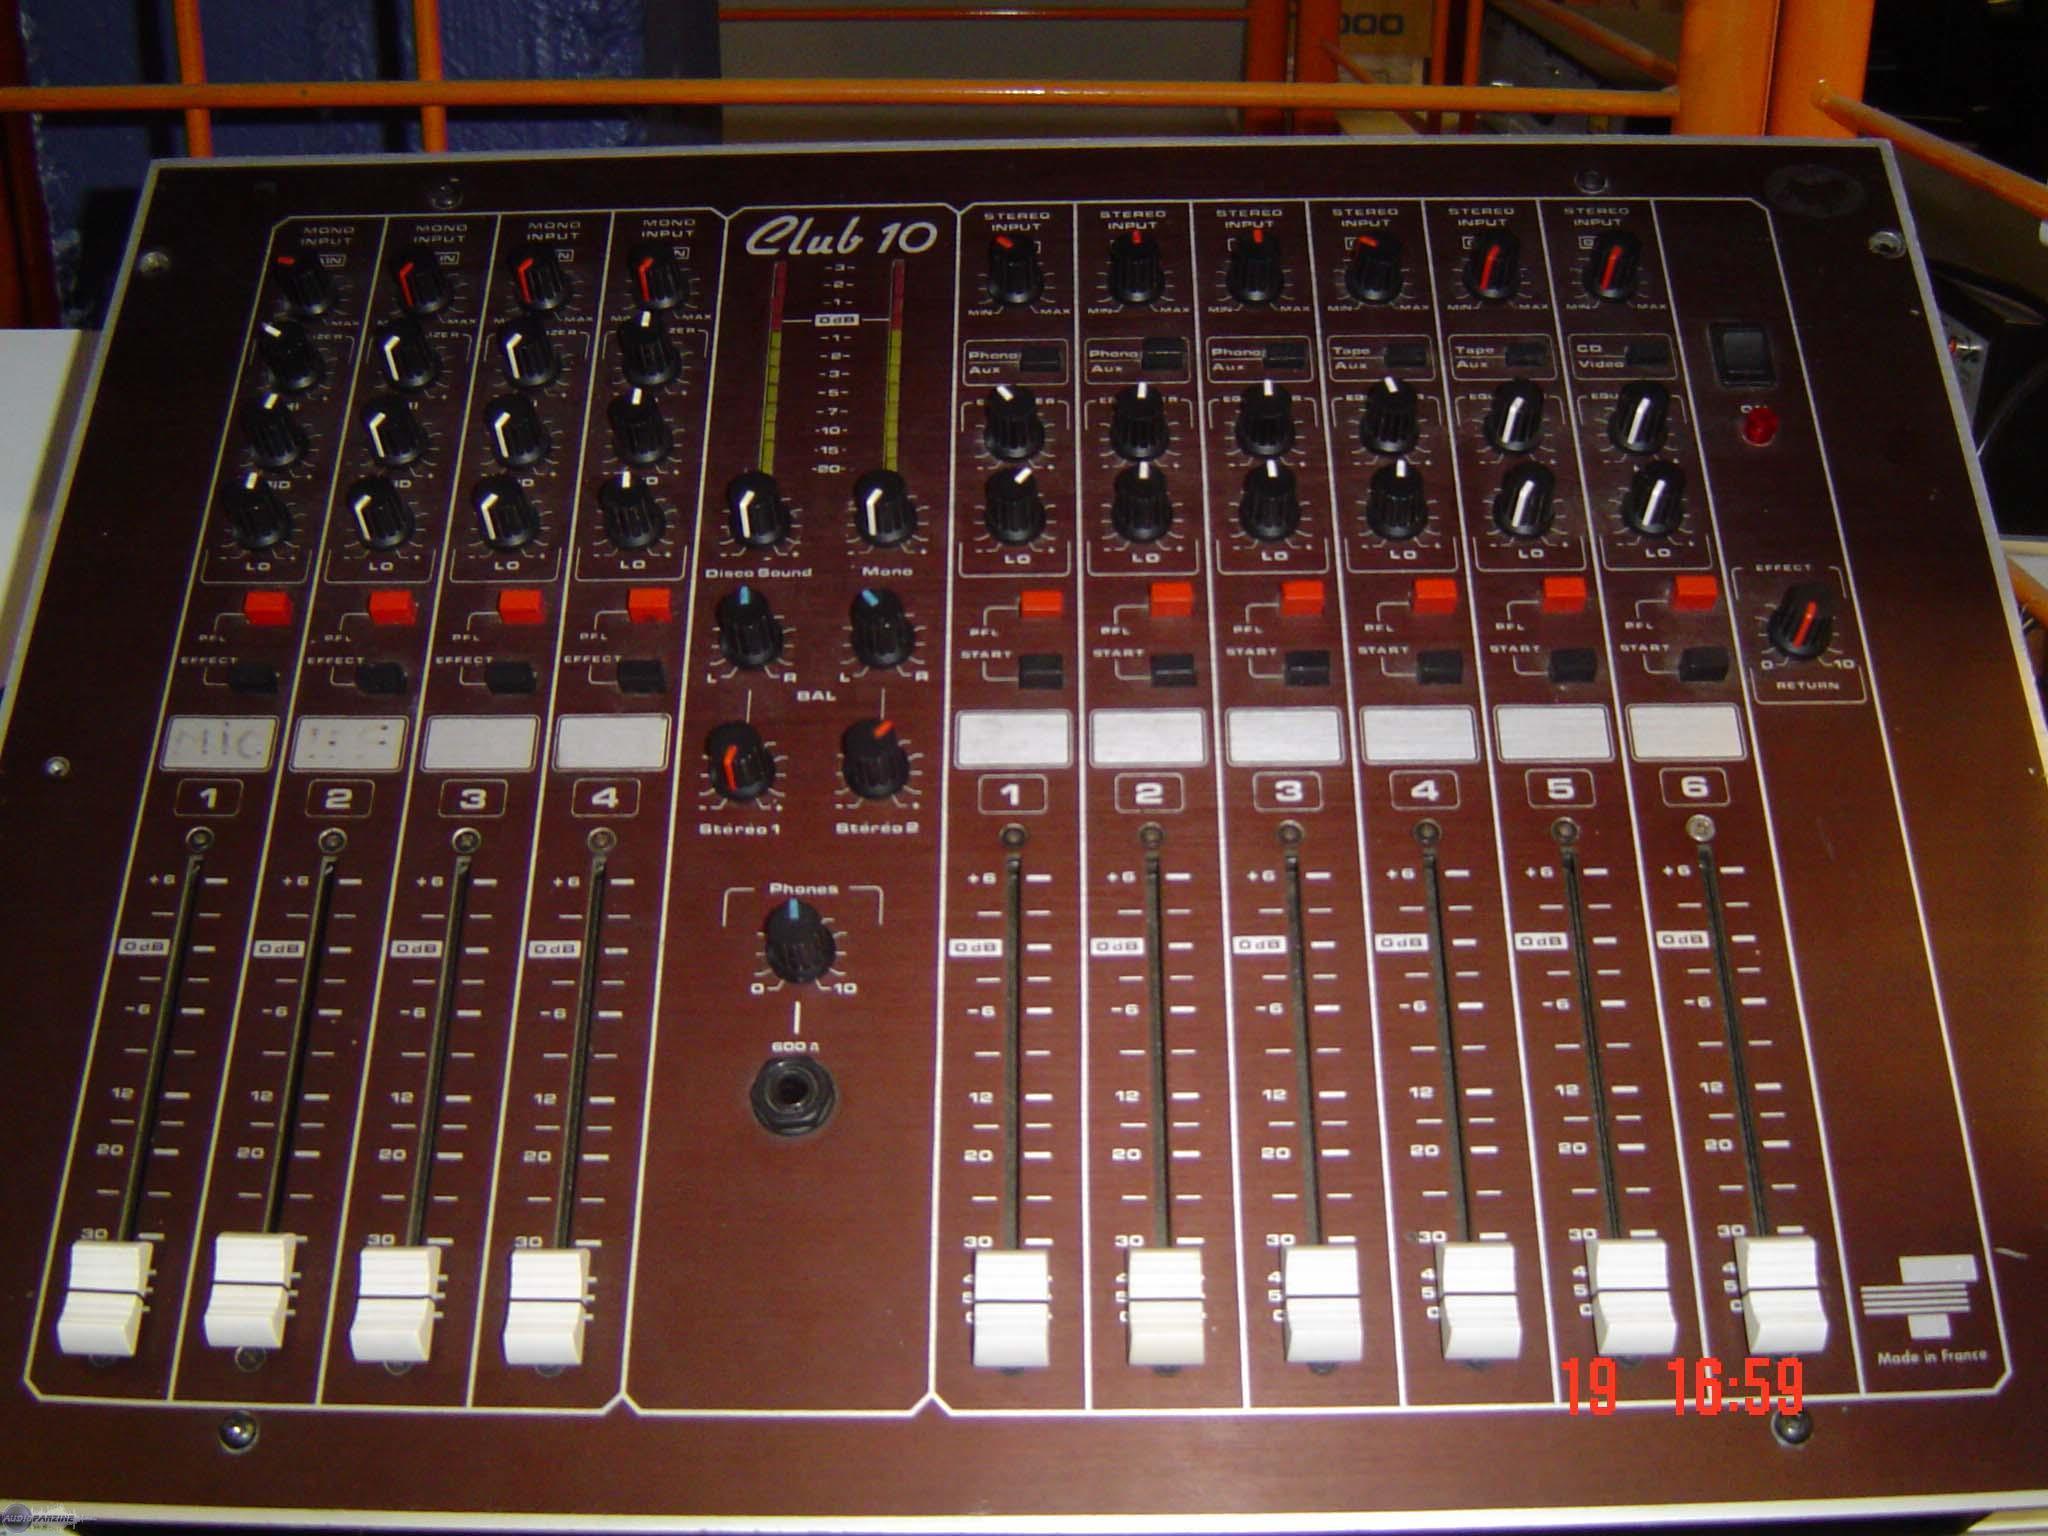 table de mixage freevox dj club